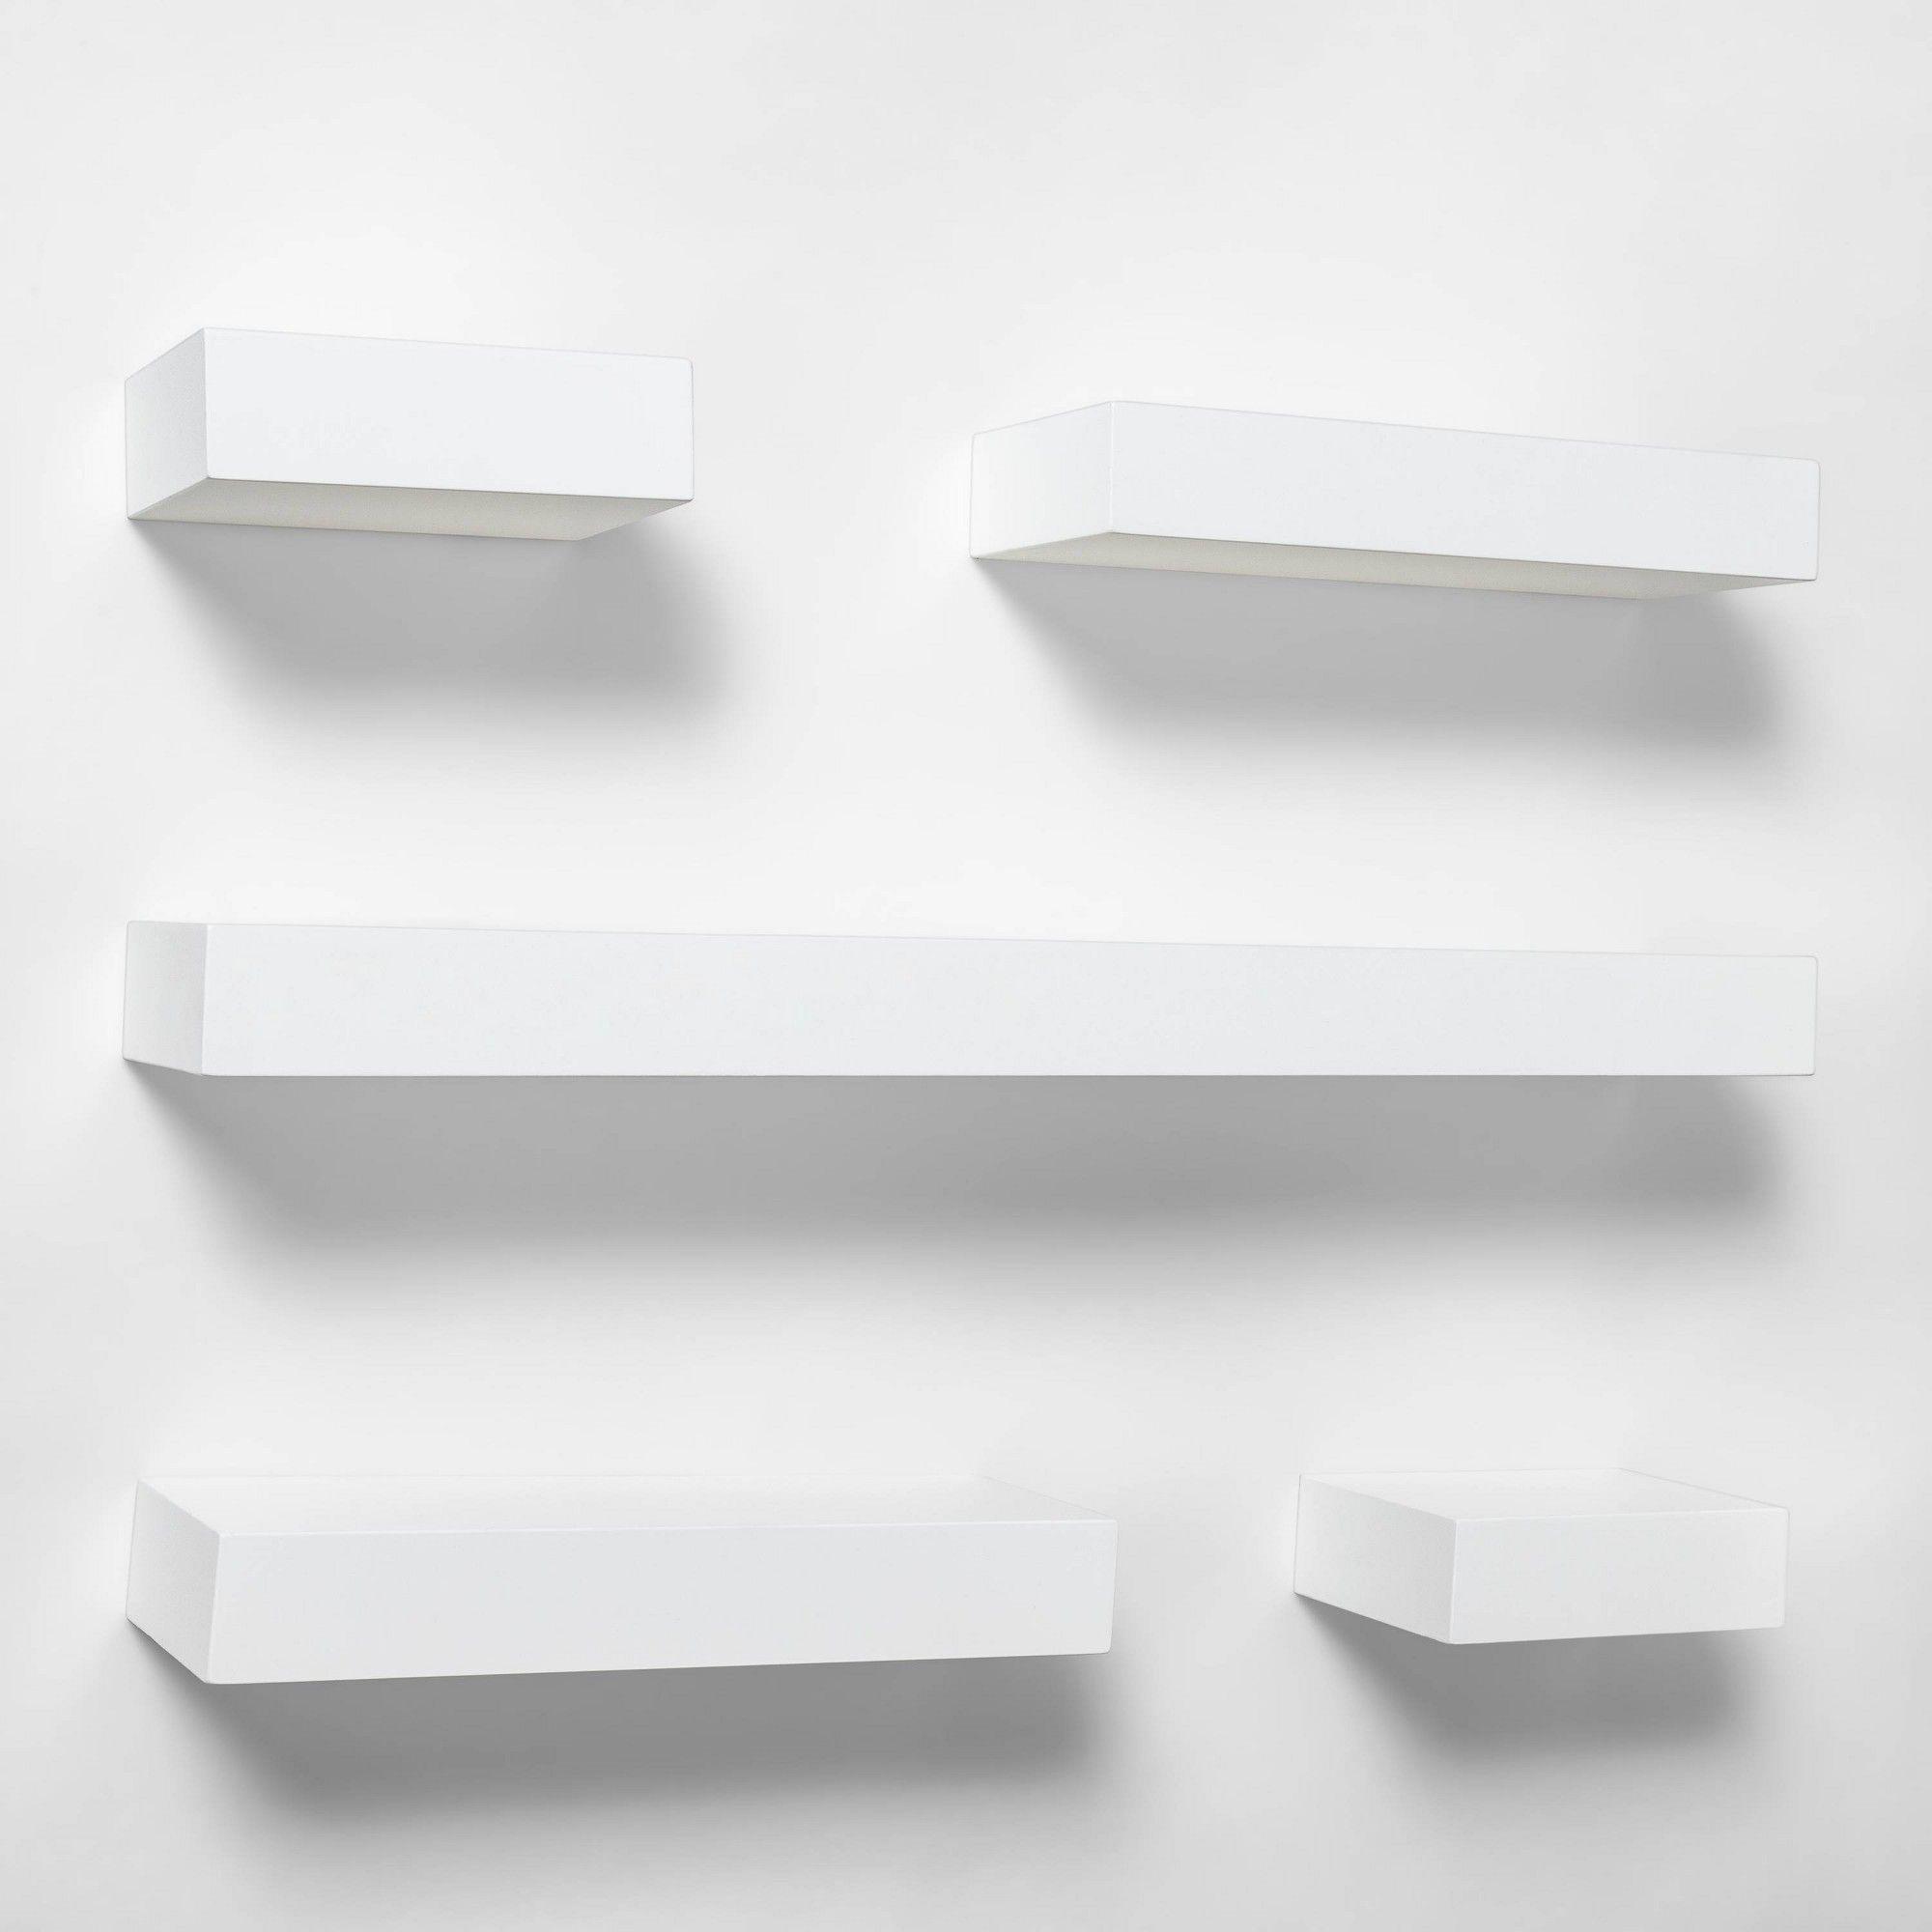 Honey Can Do 29 53 In X 3 94 In H Shape White Wall Shelf